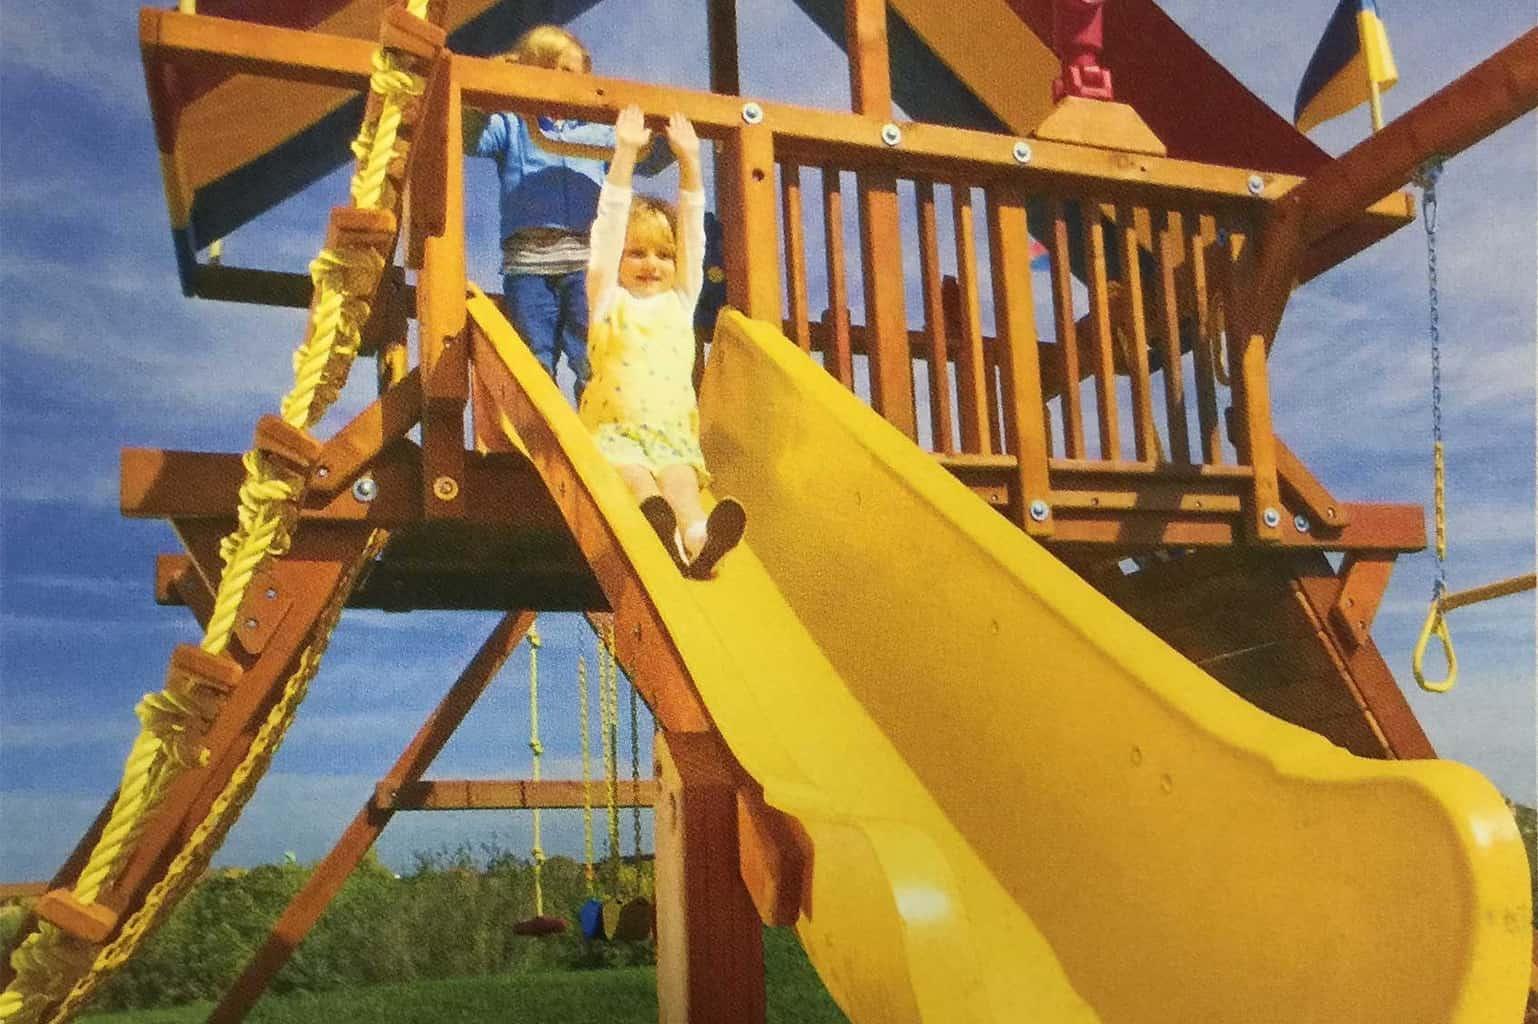 10′ Super Scoop Slide